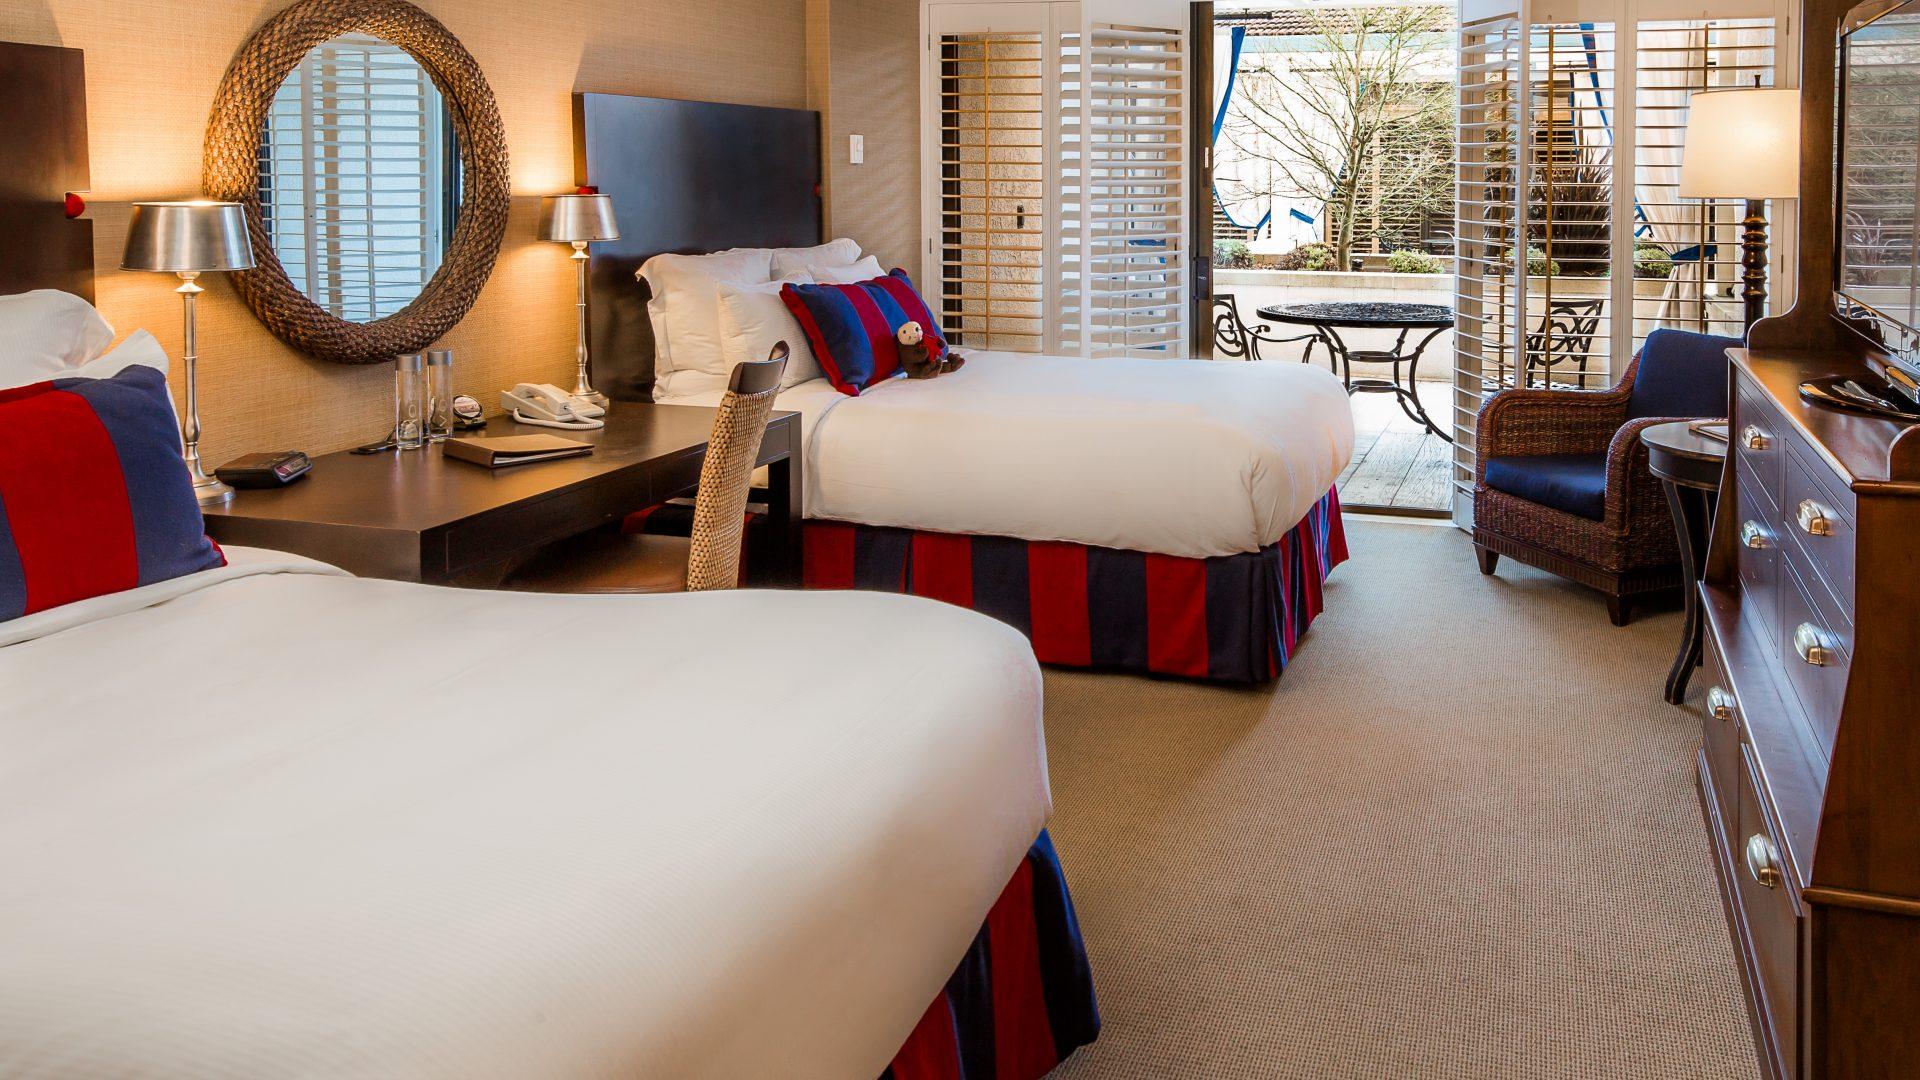 Portola Hotel & Spa at Monterey Bay image 2